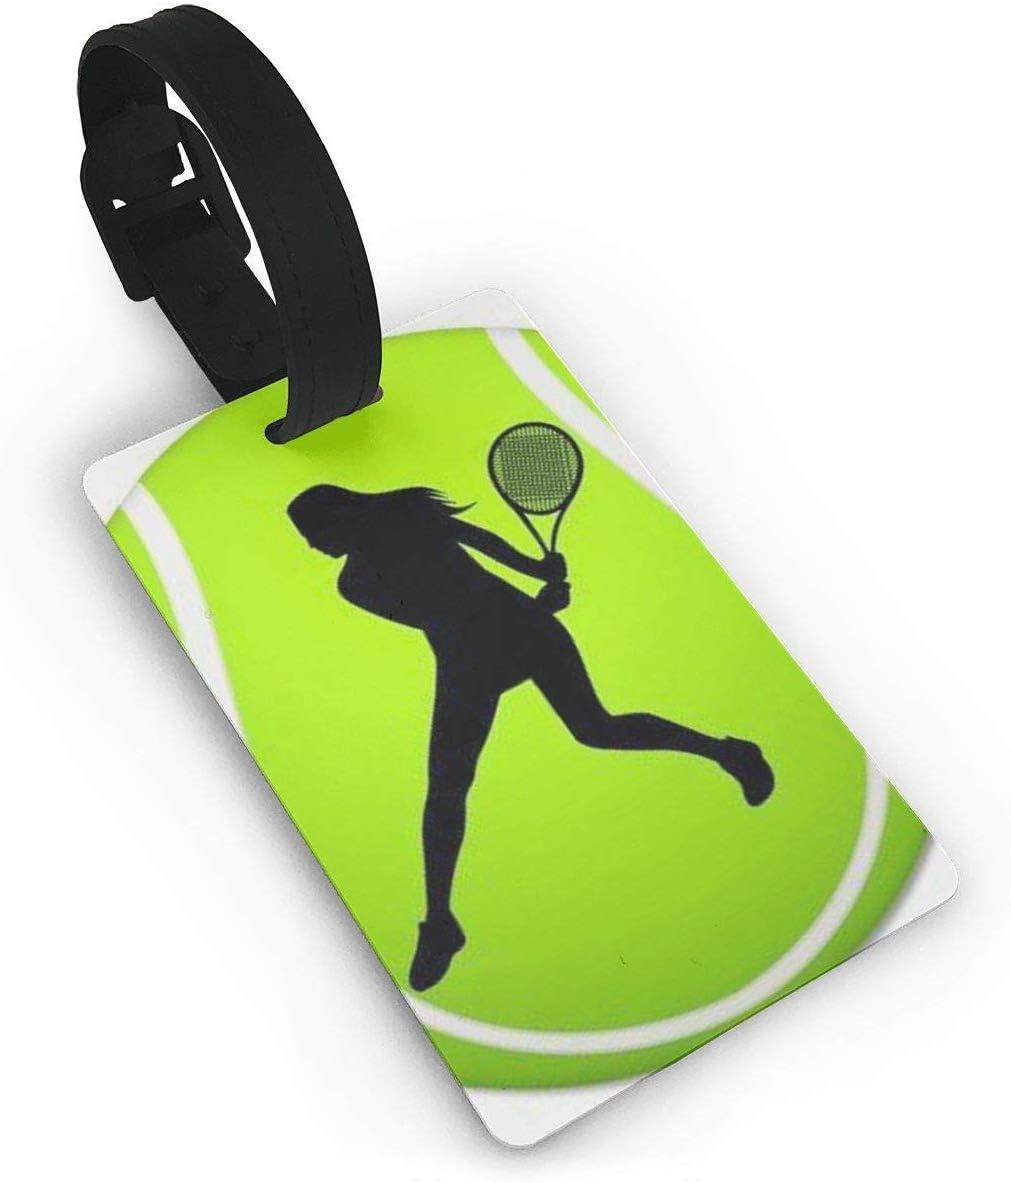 Tenis para Mujer Deporte Pelota de Aterrizaje Etiquetas de ...